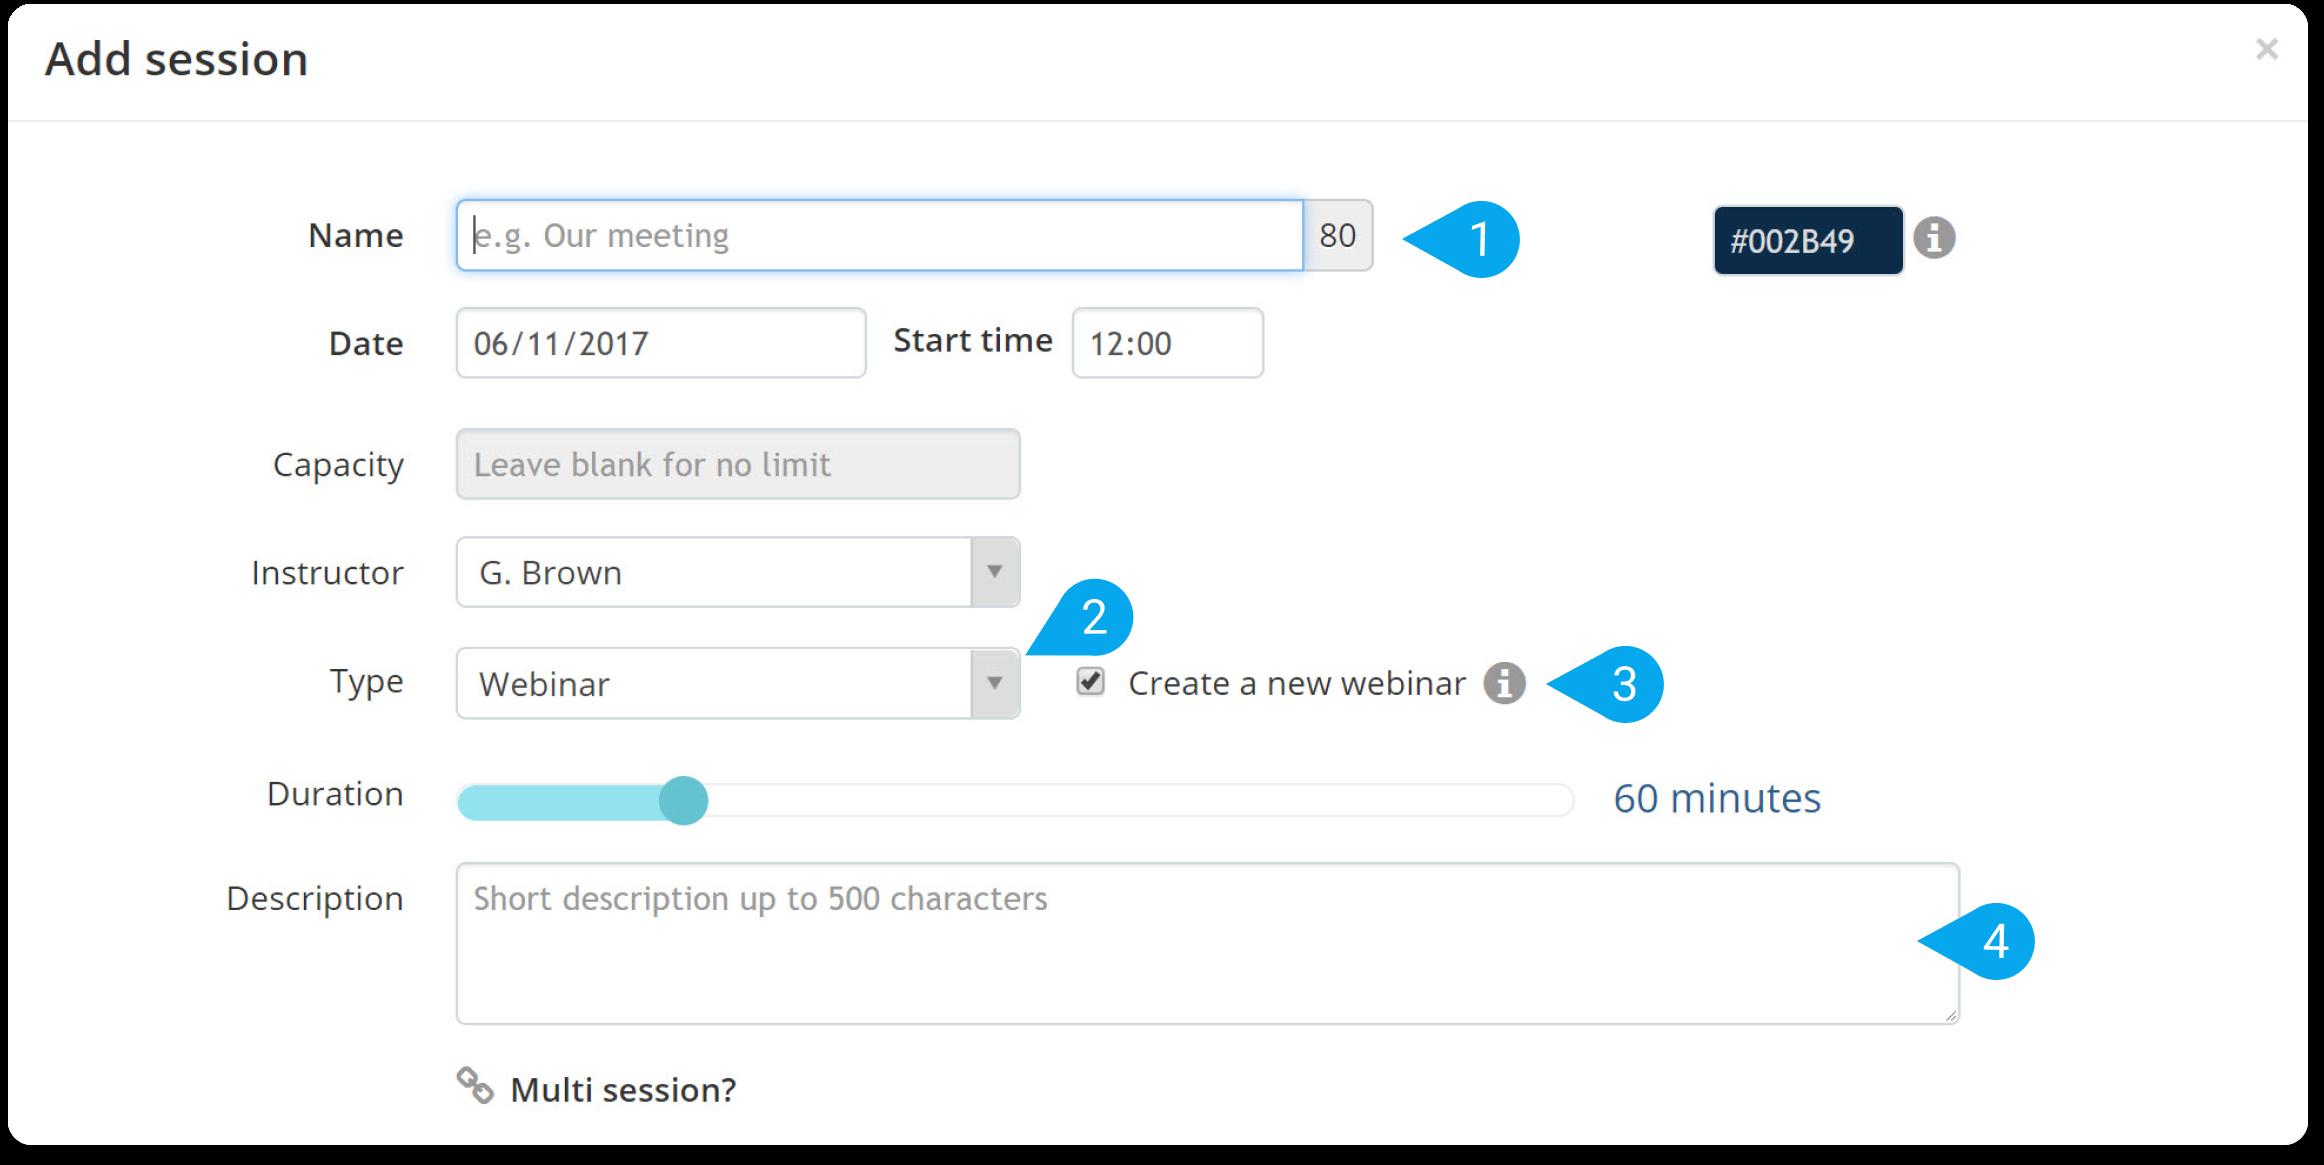 Add ILT Session in TalentLMS - TalentLMS Blog